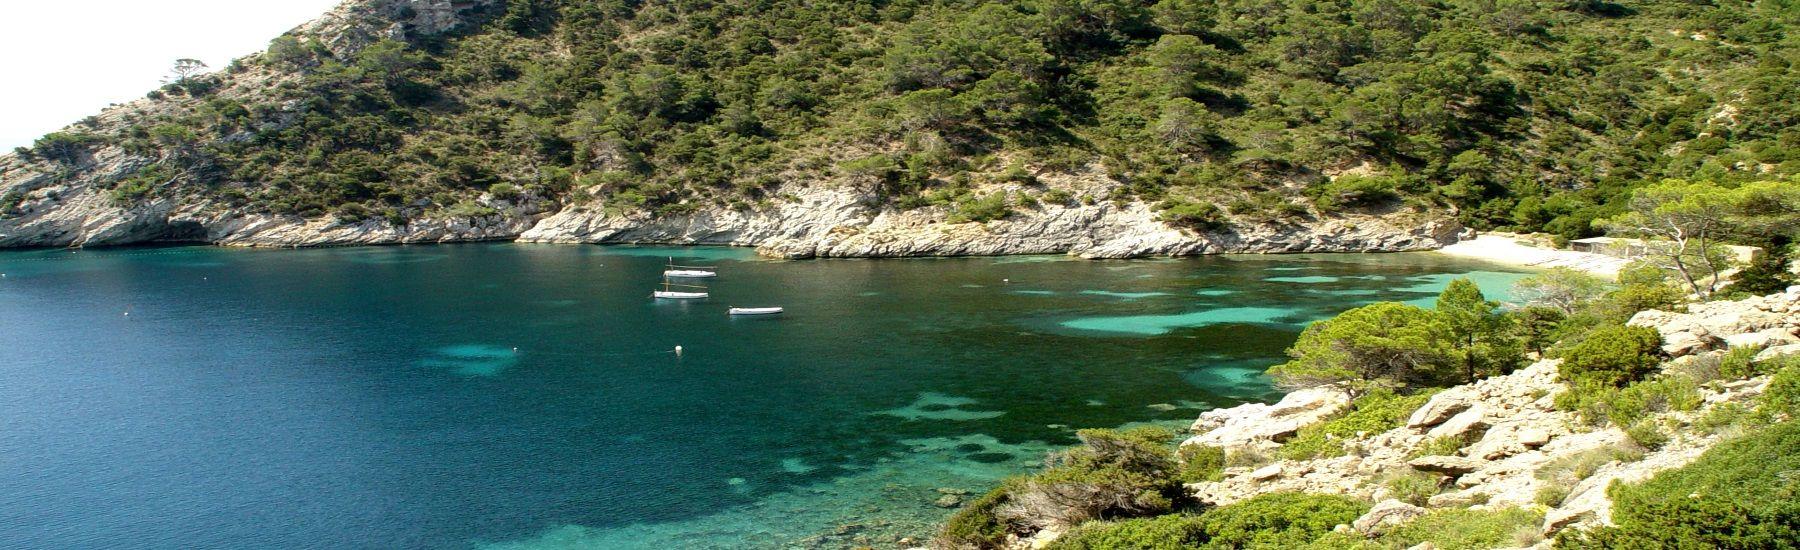 Bay in Ibiza Cala Llentrisca